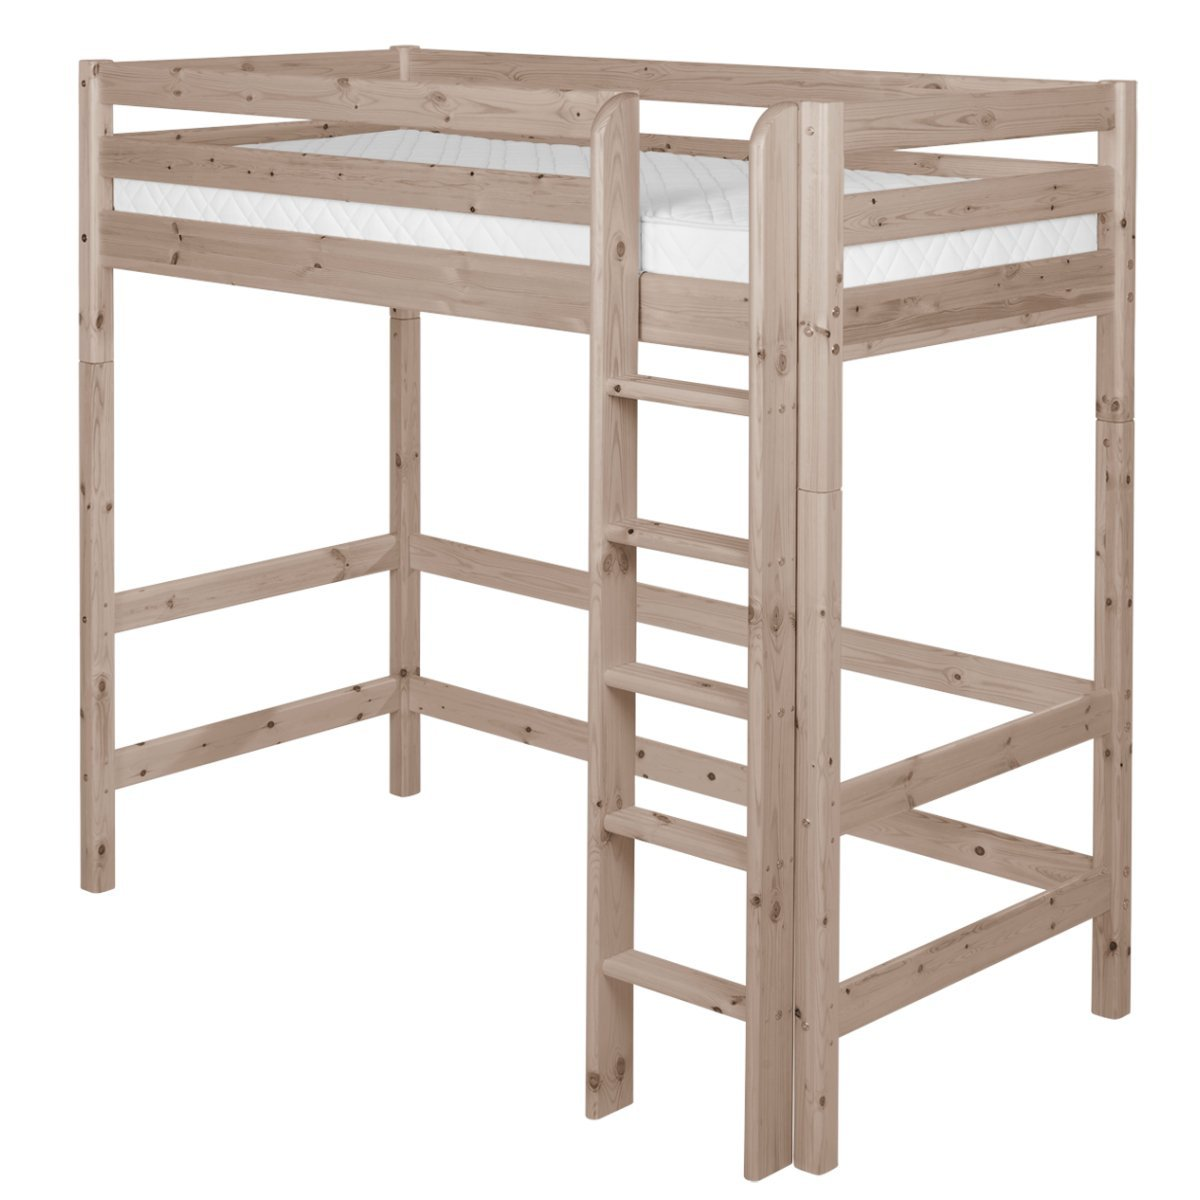 flexa classic hochbett in terra 90 10069 11 01 639. Black Bedroom Furniture Sets. Home Design Ideas